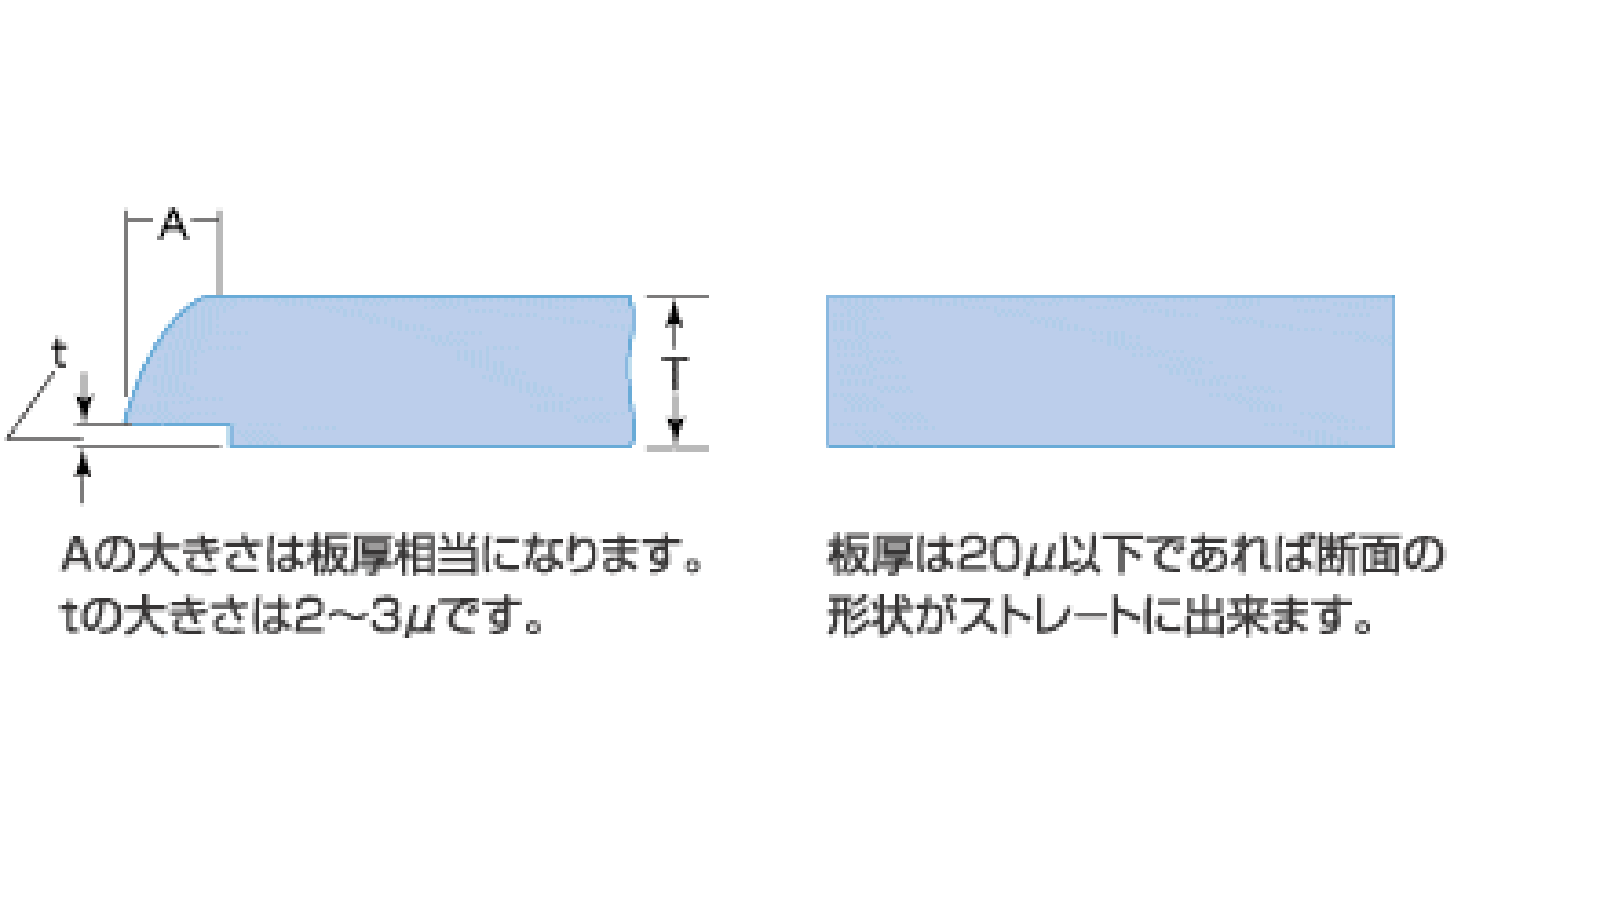 加工限度と精度 -5.断面の形状